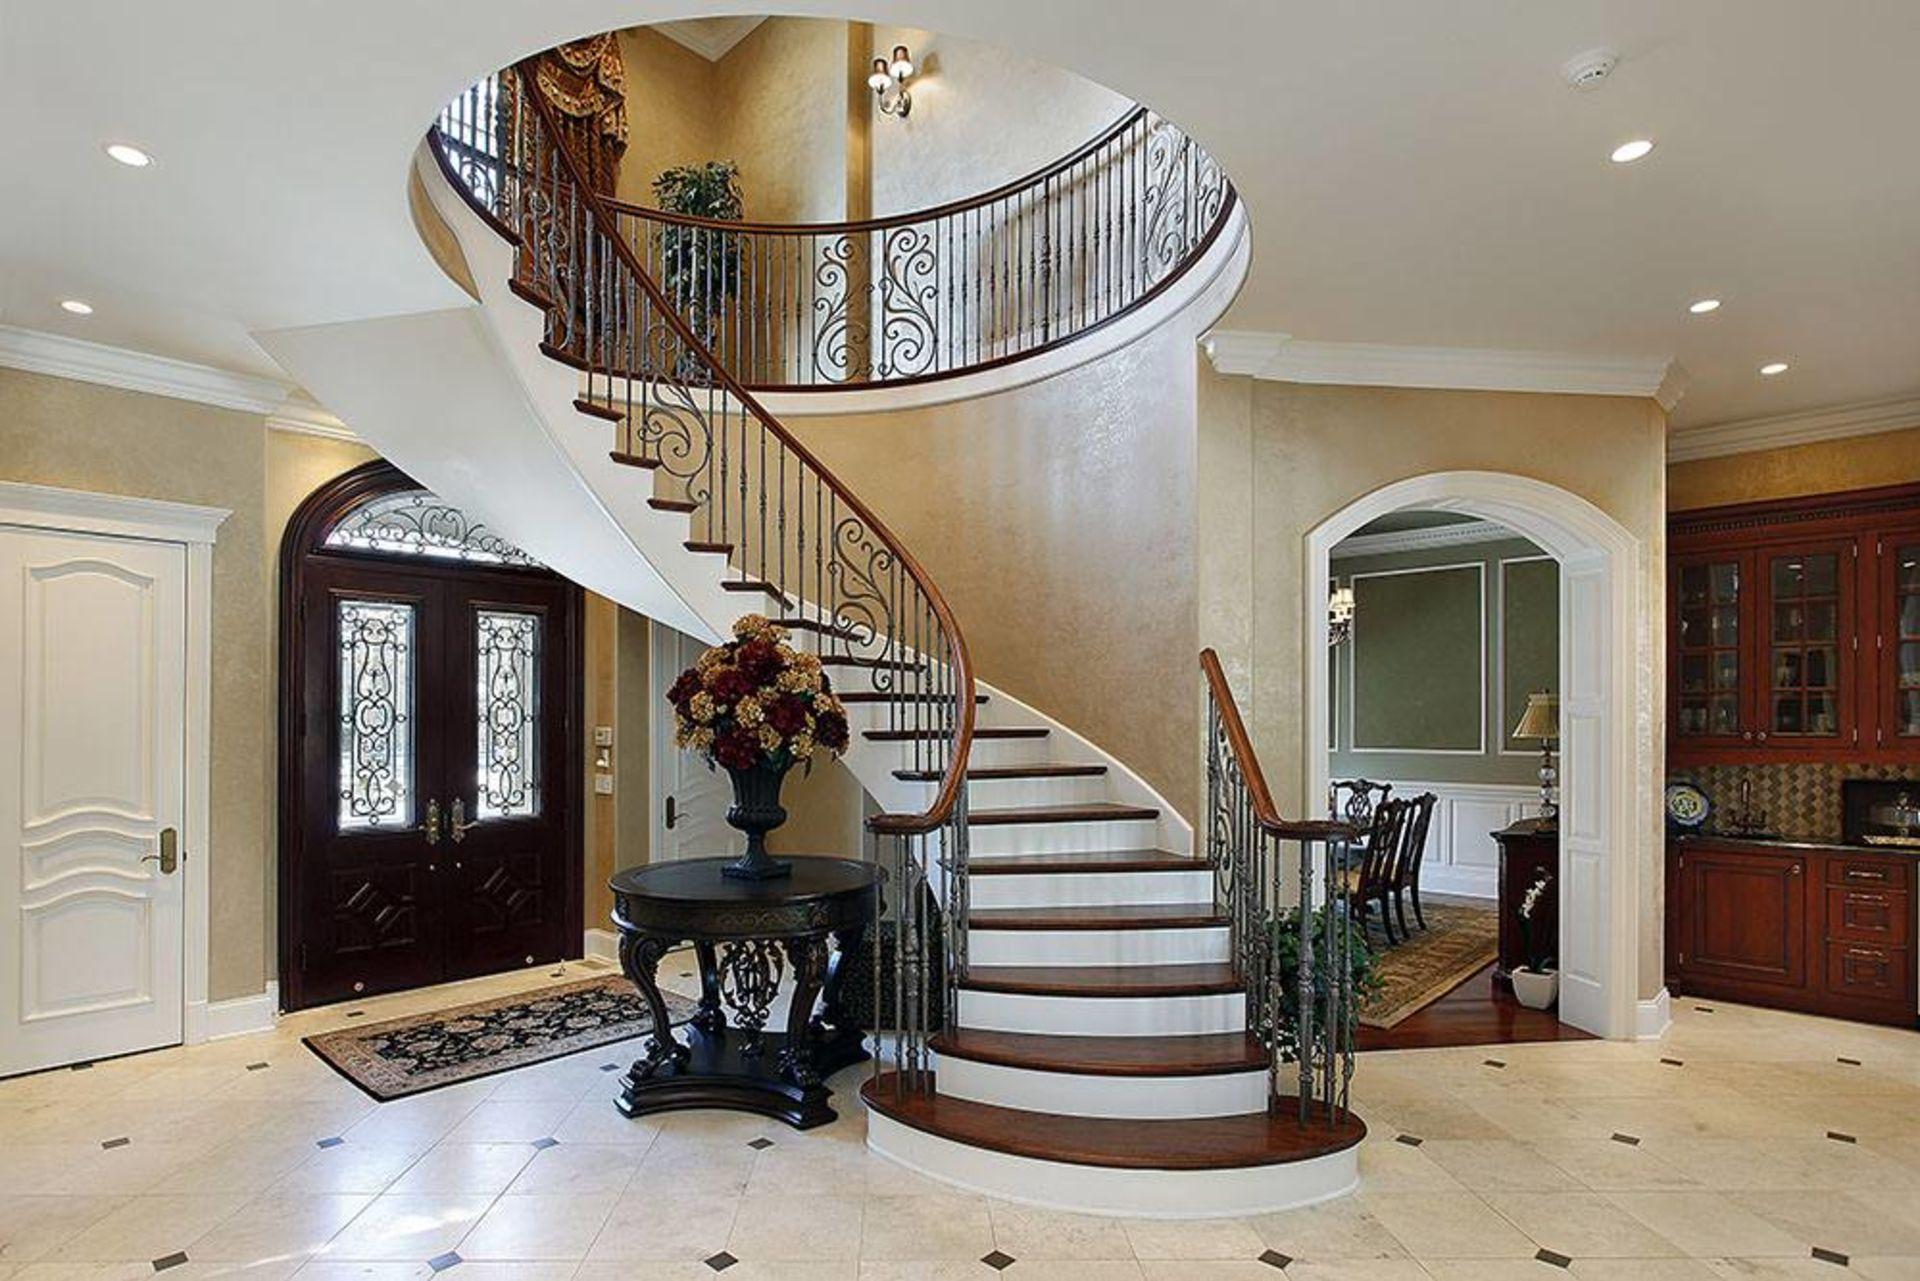 Marble, Hardwood or Shaggy Carpet?